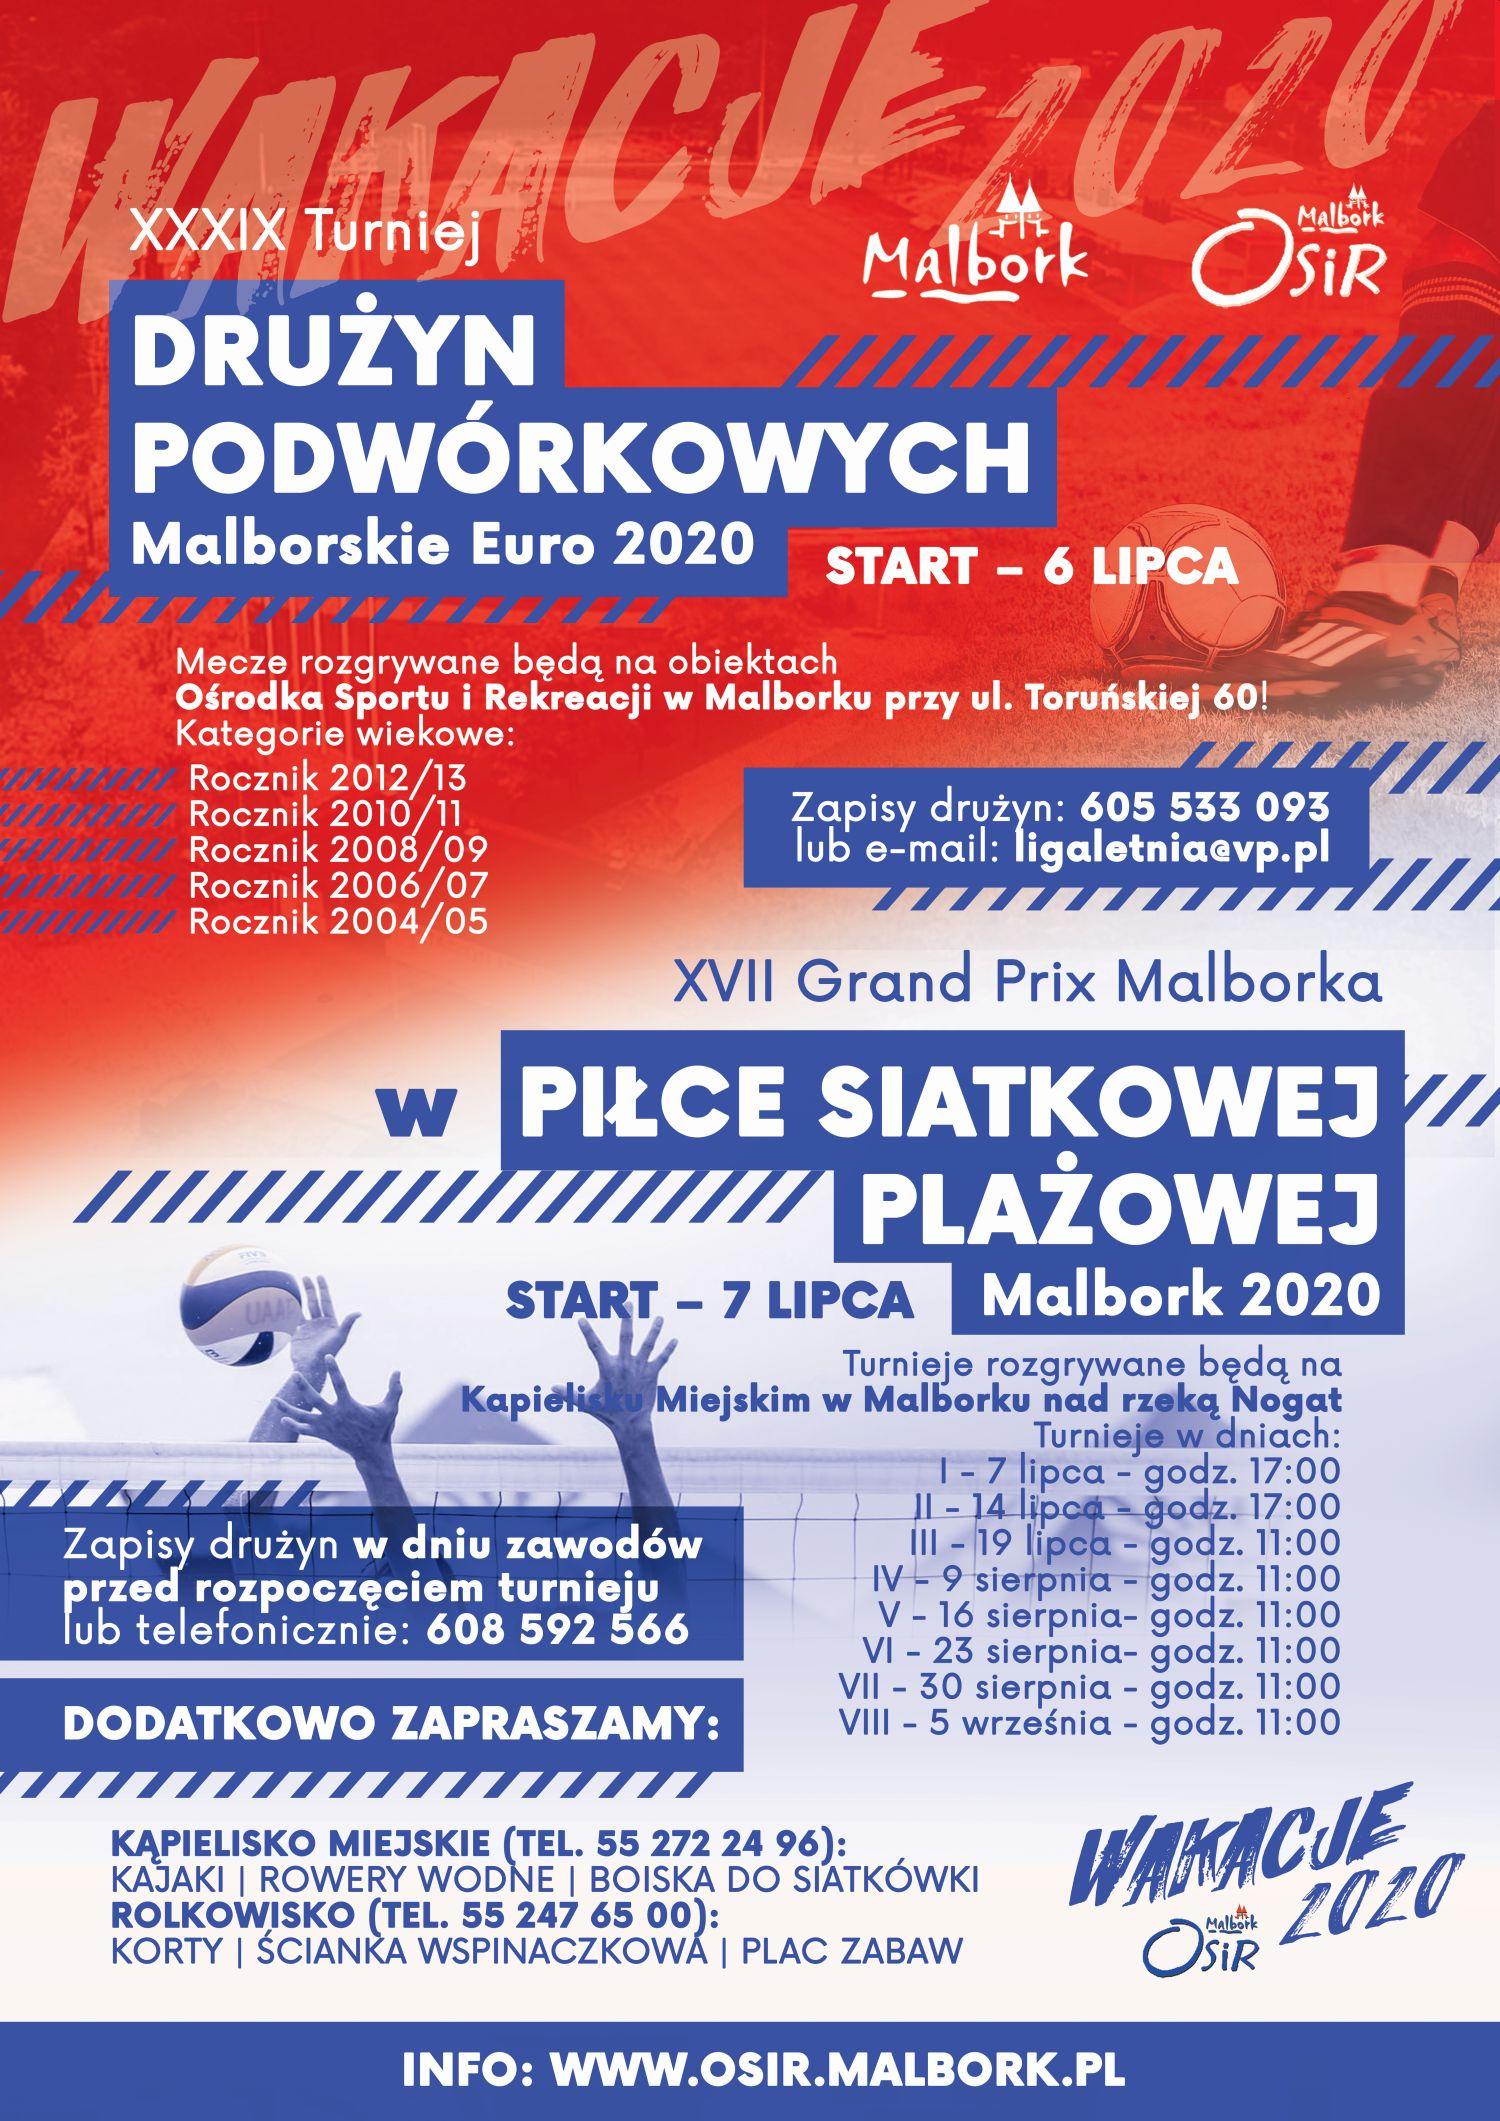 http://m.82-200.pl/2020/06/orig/plakat-nowy-6239.jpg